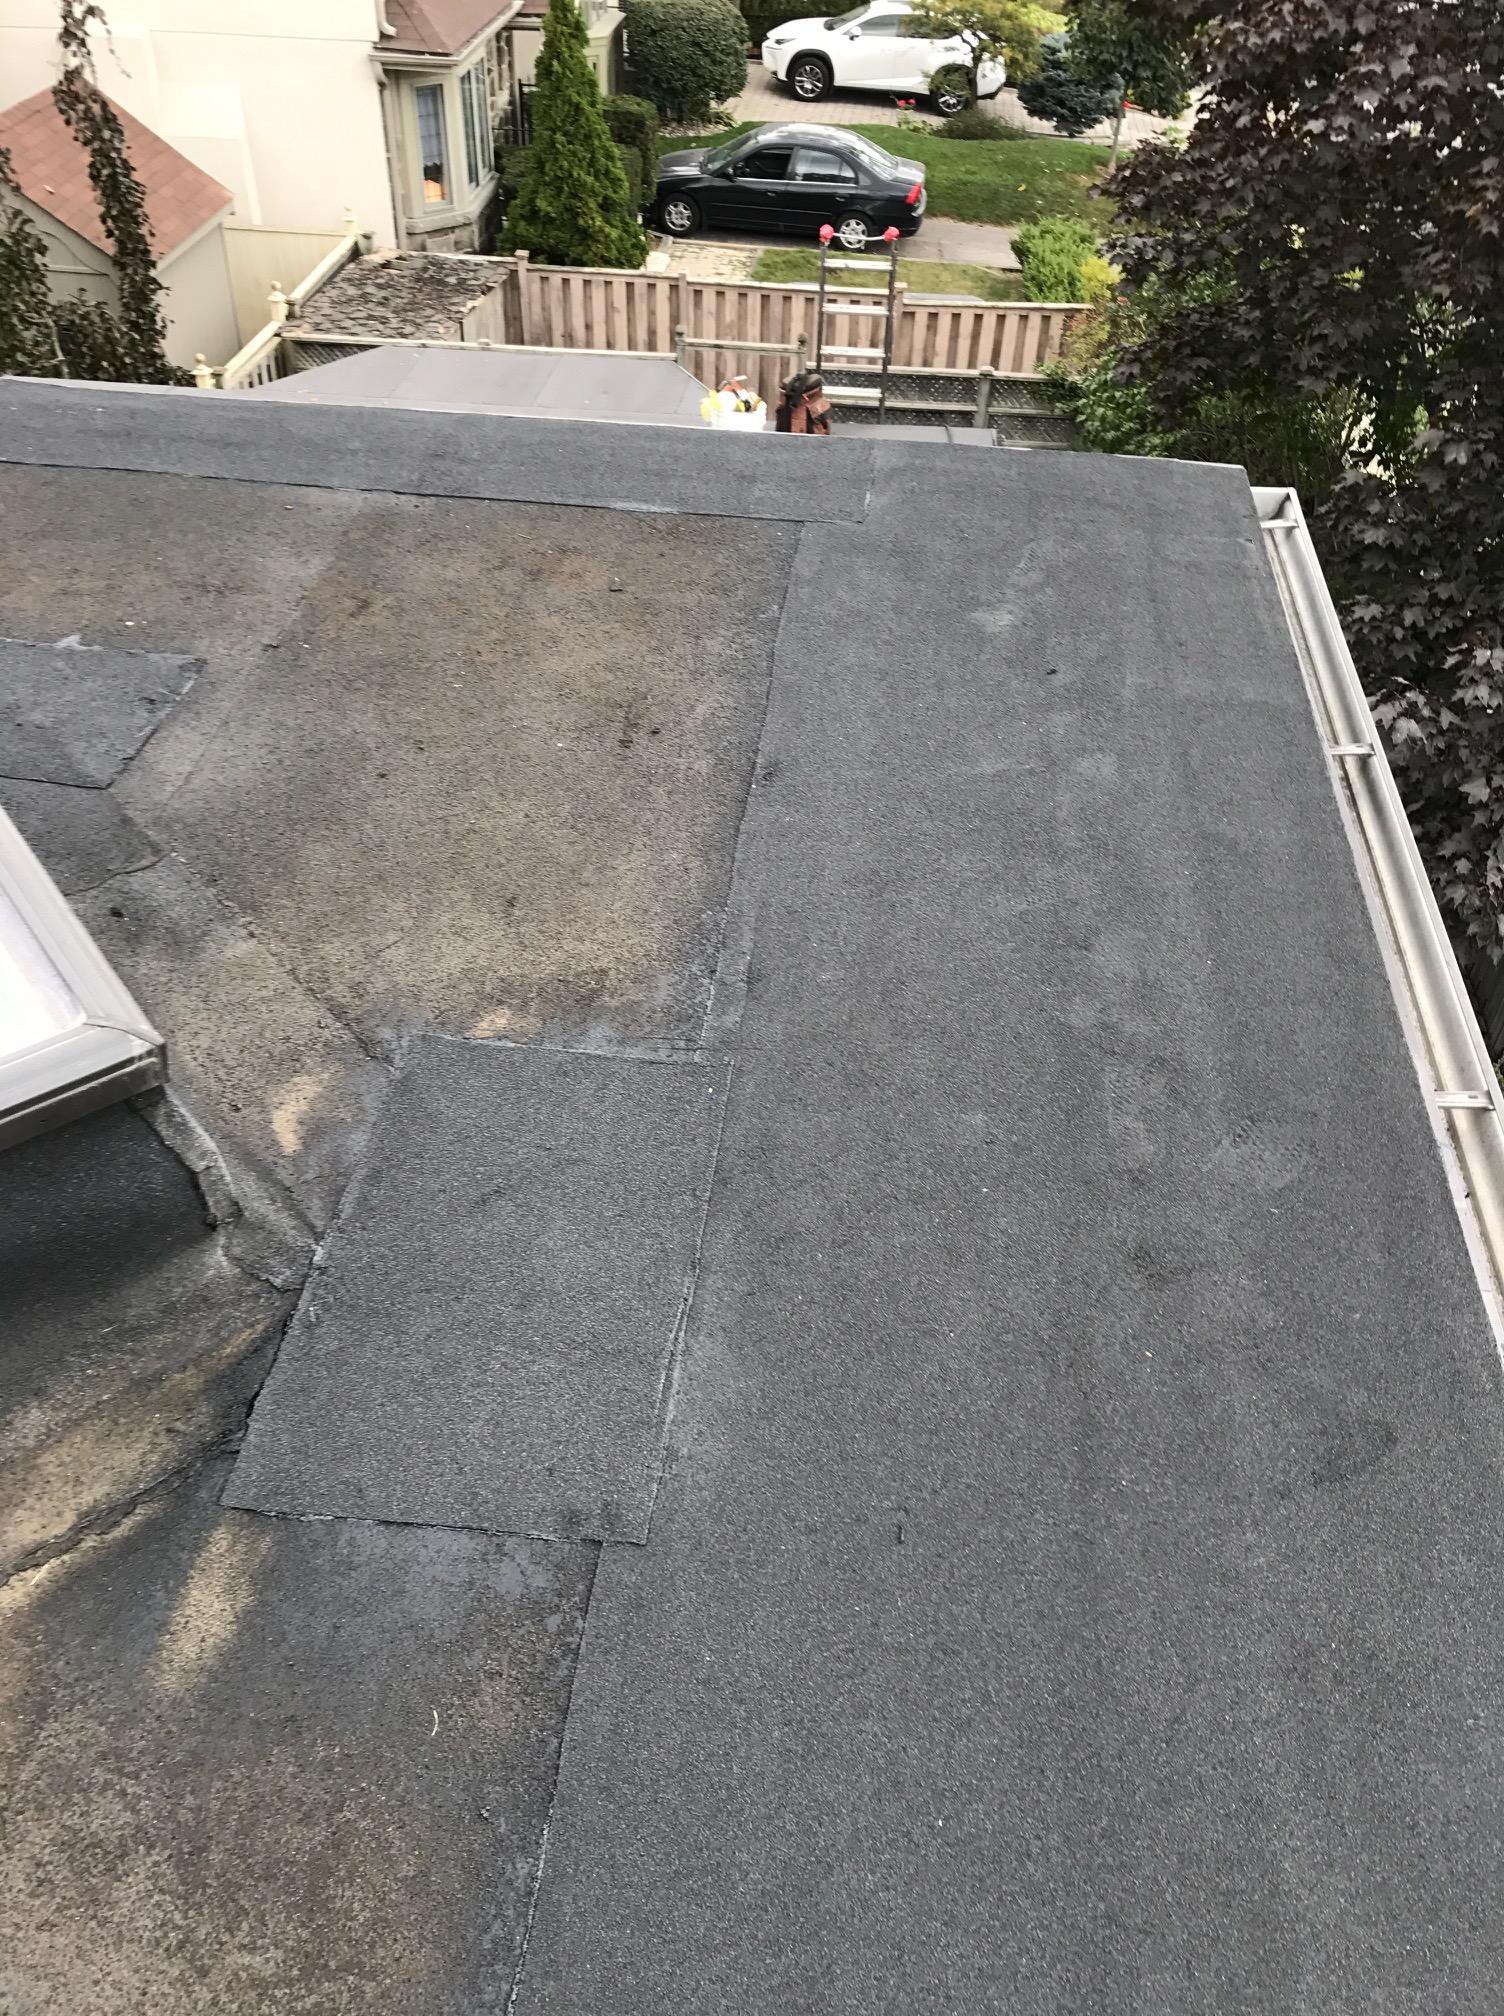 Mineral surfaced Soprema membrane flat Toronto